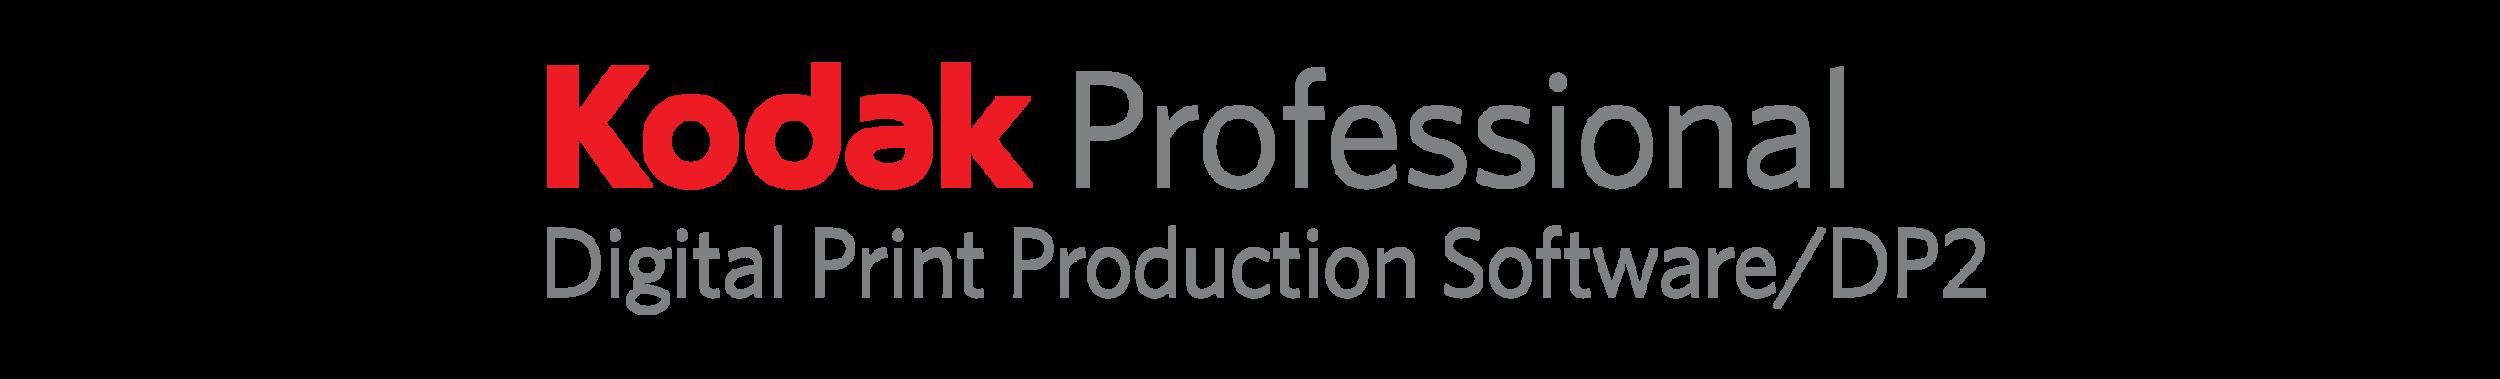 Kodak Professional Digital Print Production Software - DP2